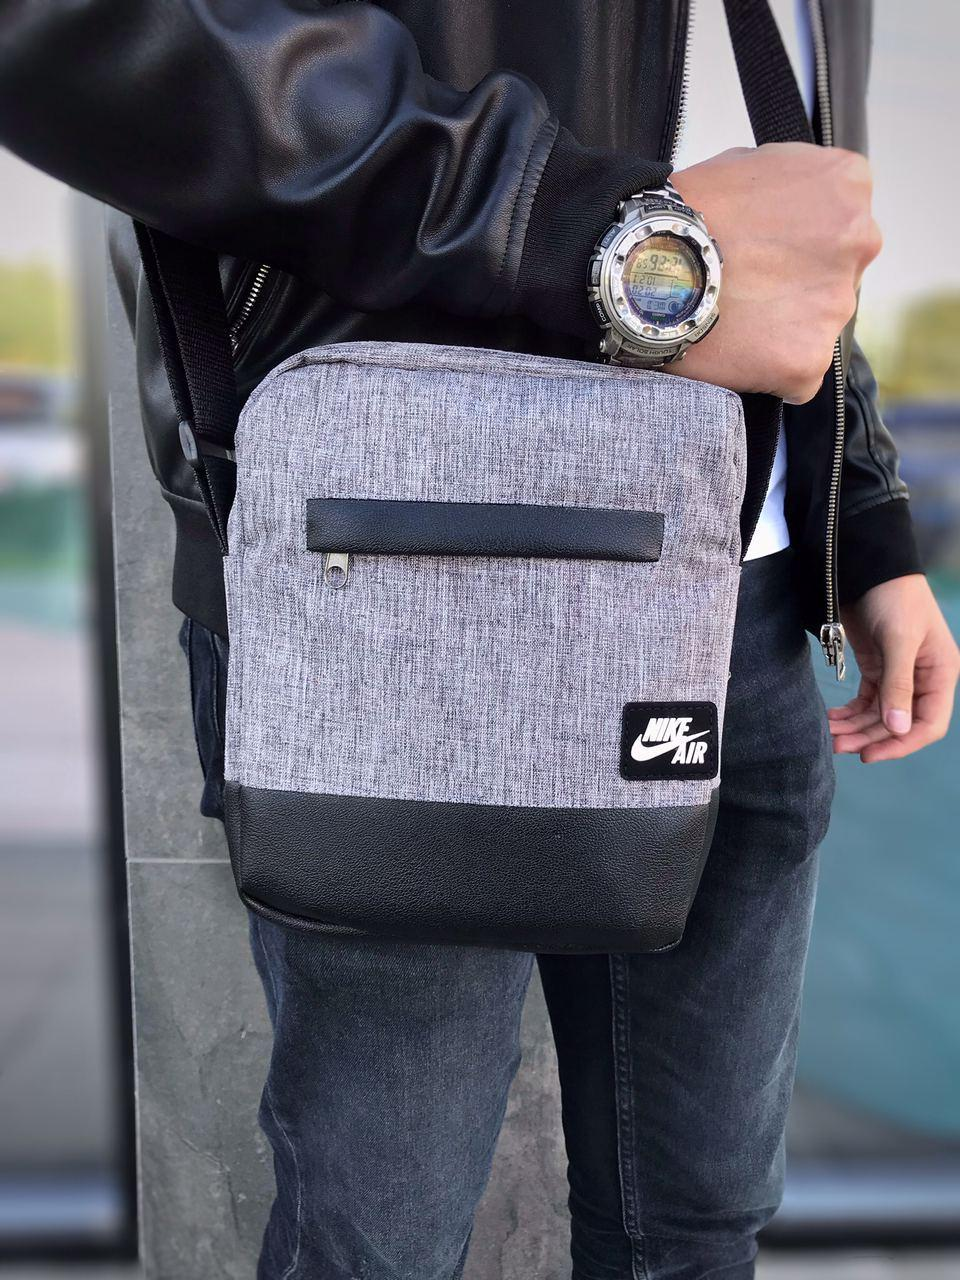 Барсетка Nike Air Мужская сумка через плечо Мессенджер Женская